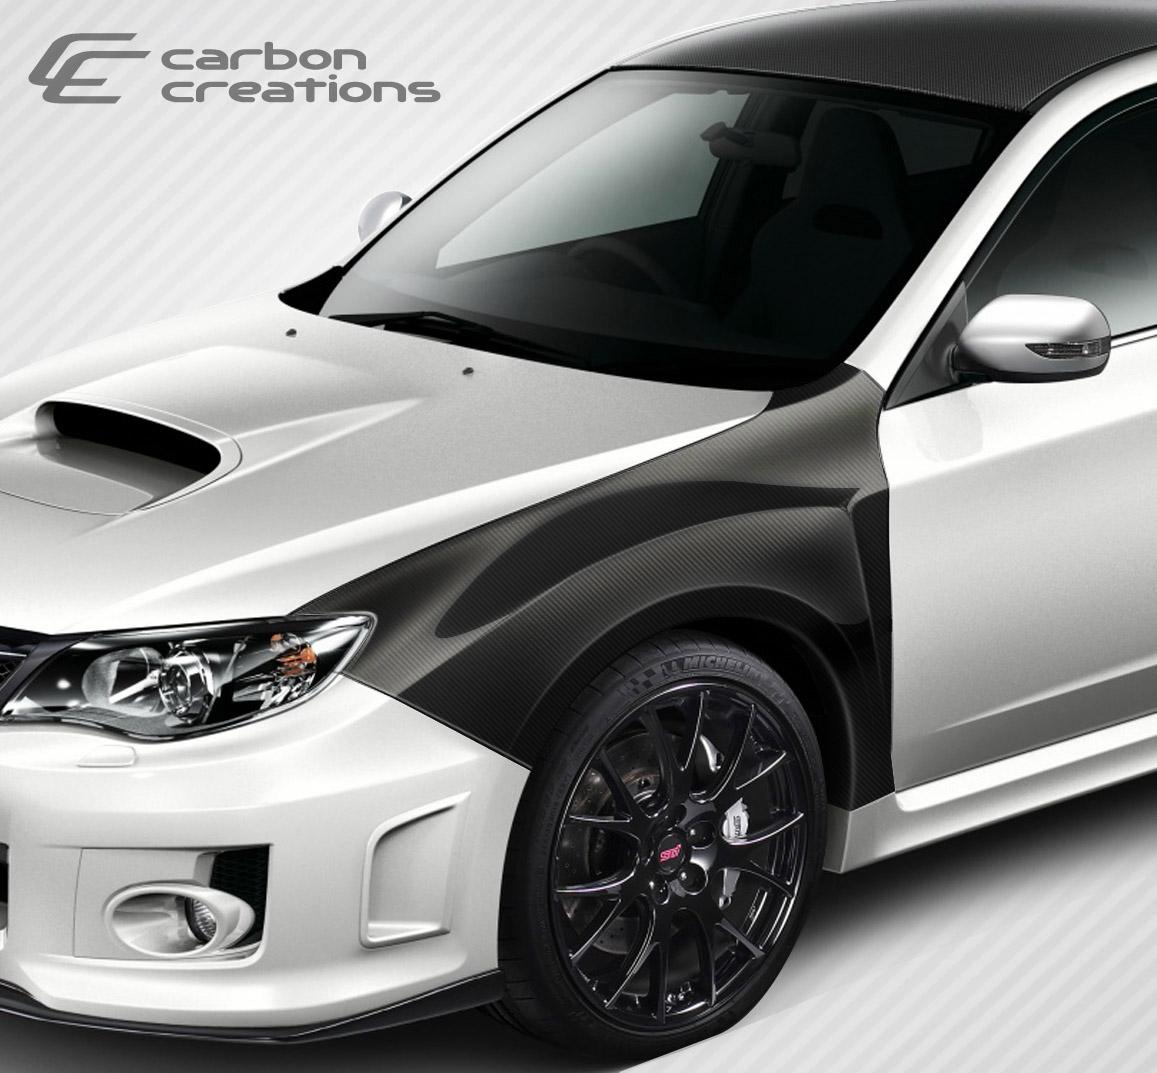 Raj D S 2014 Impreza Wrx Premium: Carbon Creations 08-14 Vortex Fenders- 1YR Warranty